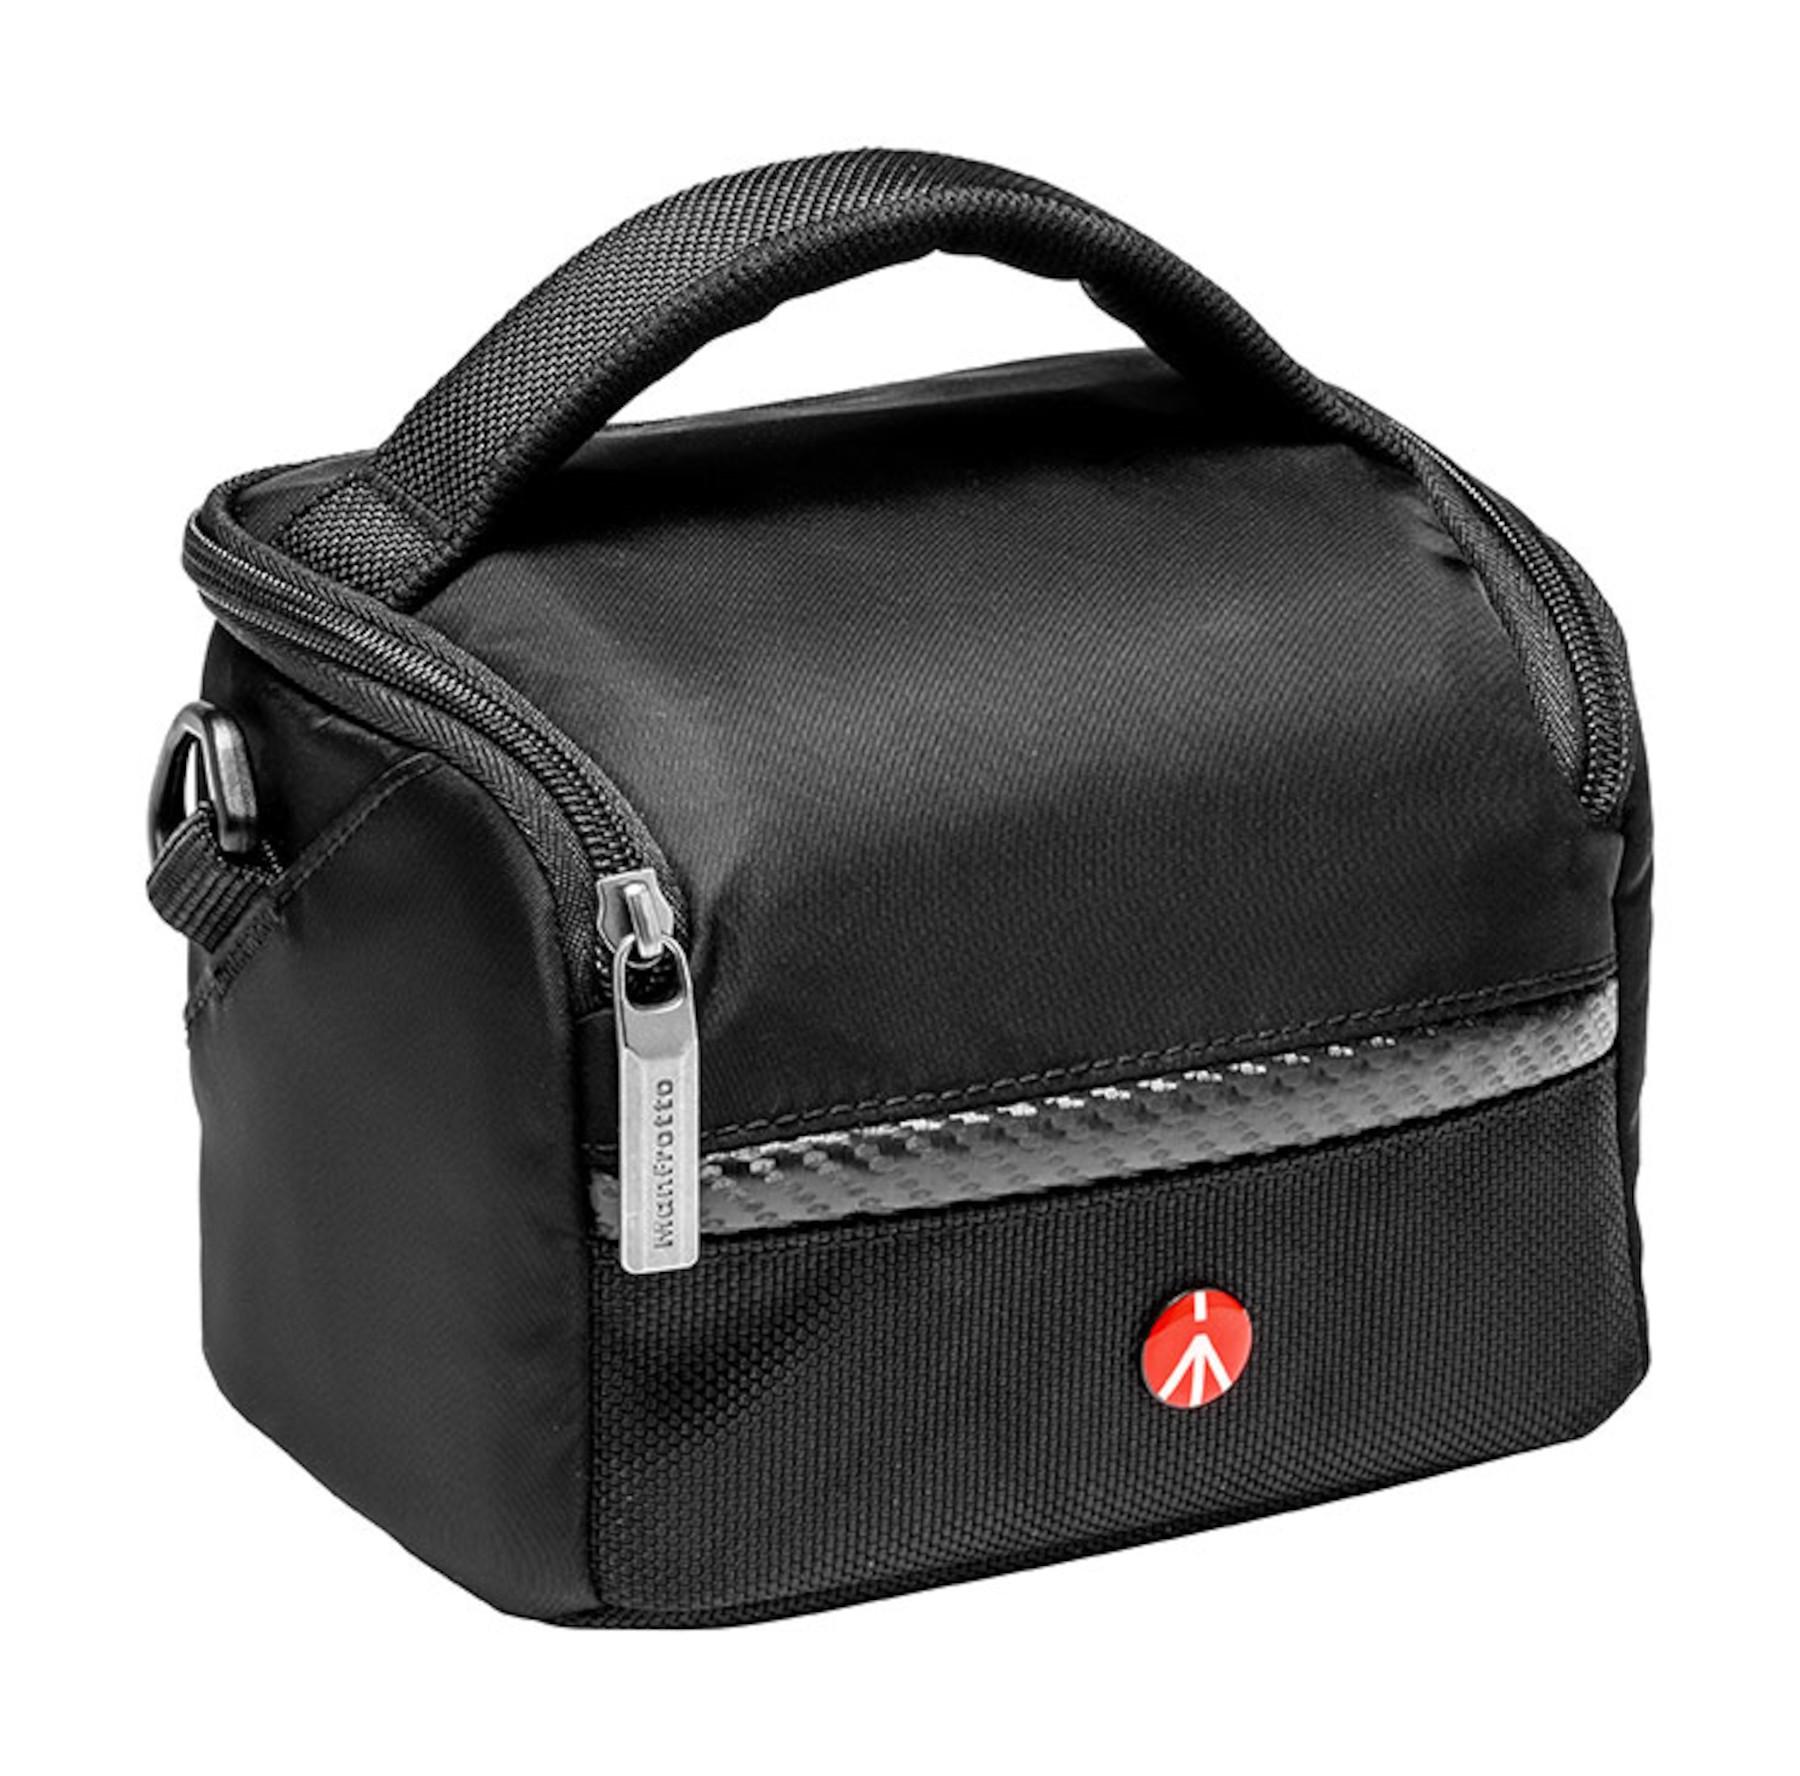 Black Nylon Shoulder Bag for Mirrorless Camera and 2 Lenses